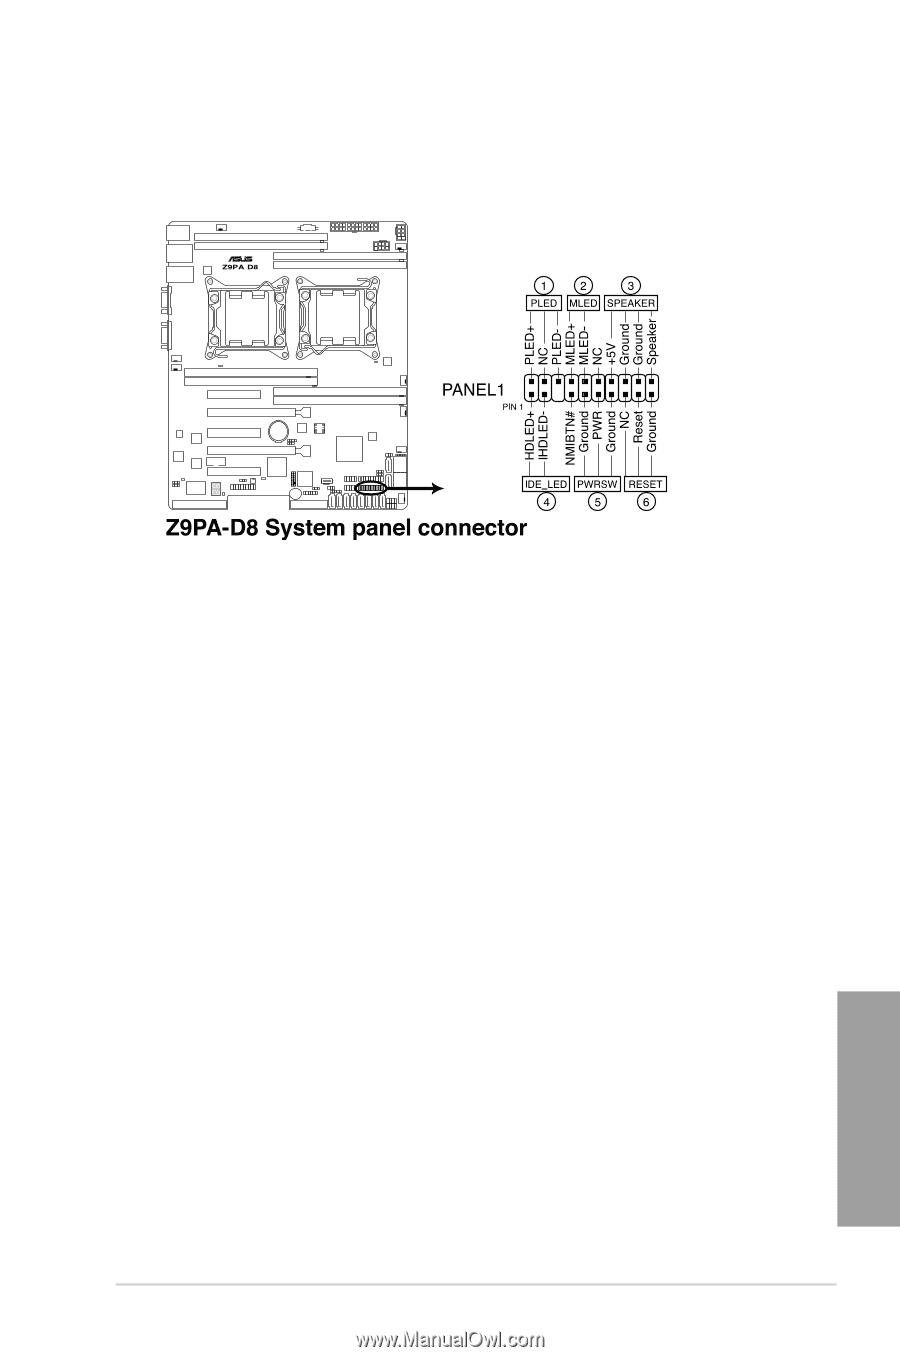 ASUS TS700-X7PS4 ASMEDIA USB 3.0 WINDOWS 8 X64 DRIVER DOWNLOAD